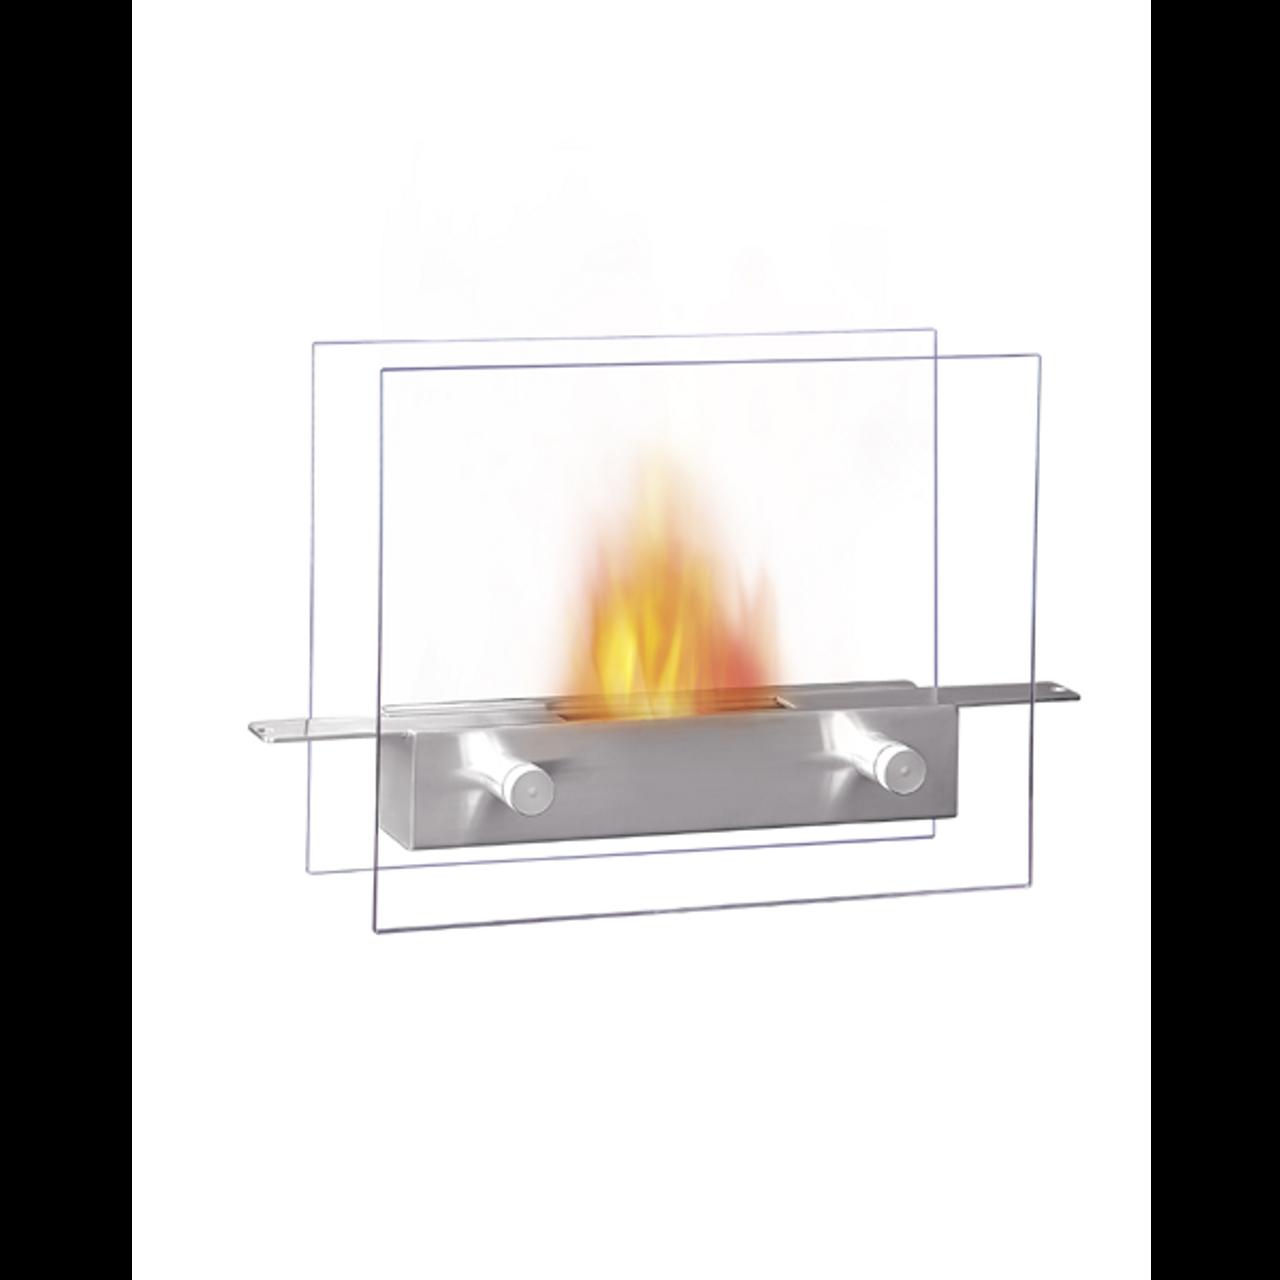 Metropolitan Modern Tabletop Fireplace Modern Indoor Furniture